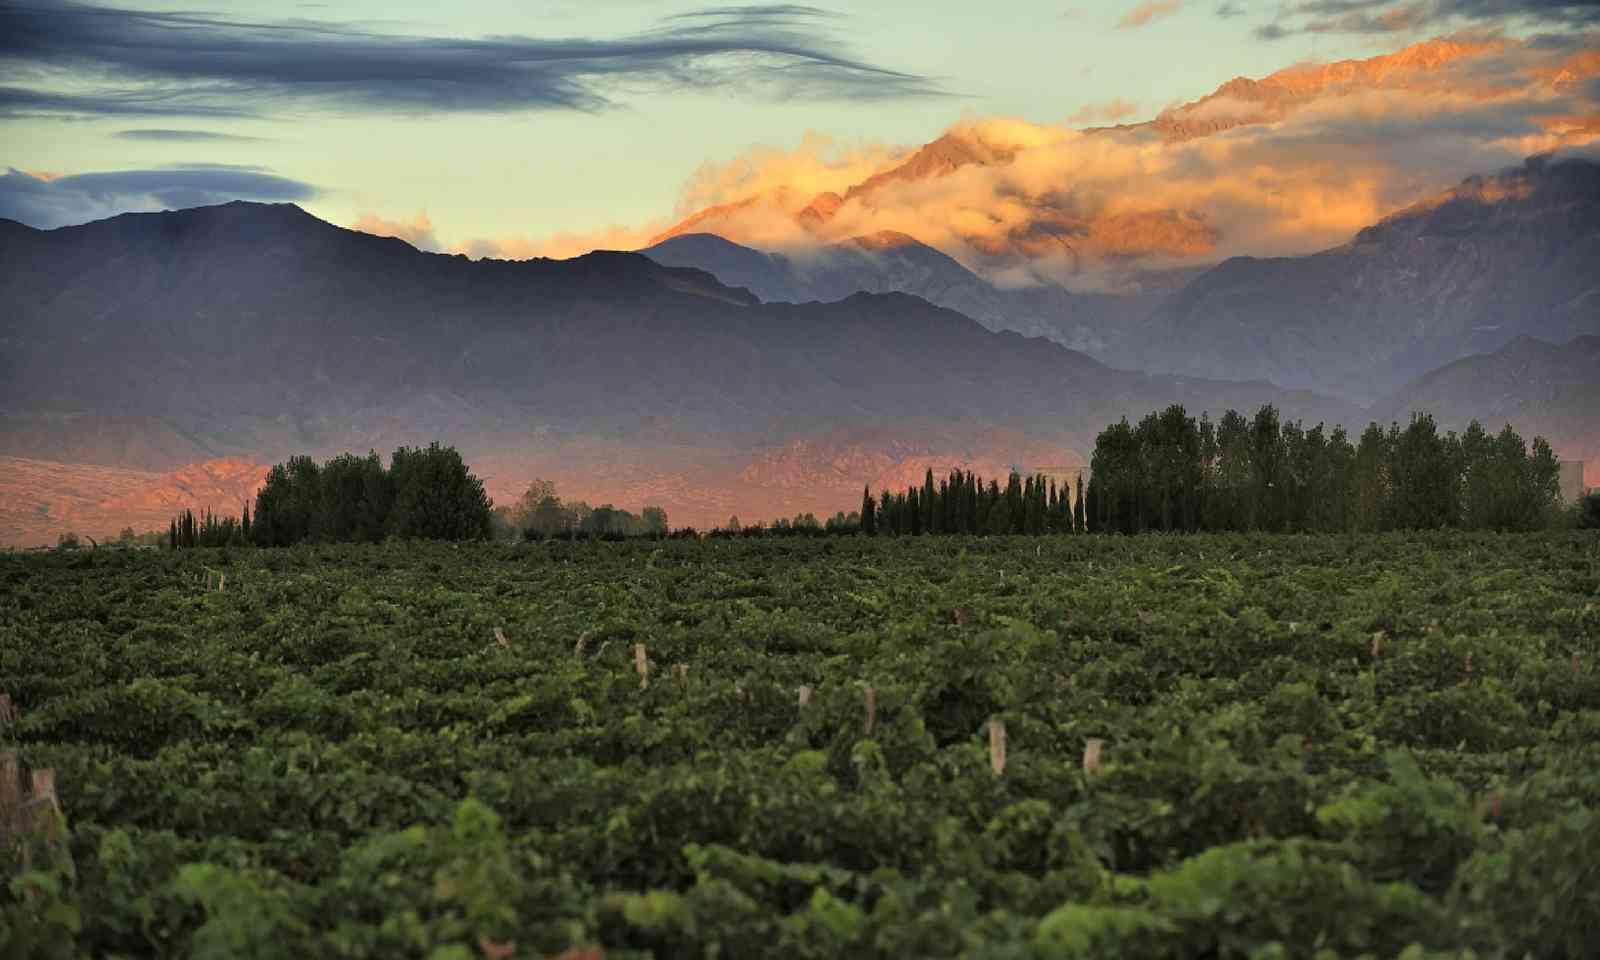 Sunrise in Medoza (Shutterstock)